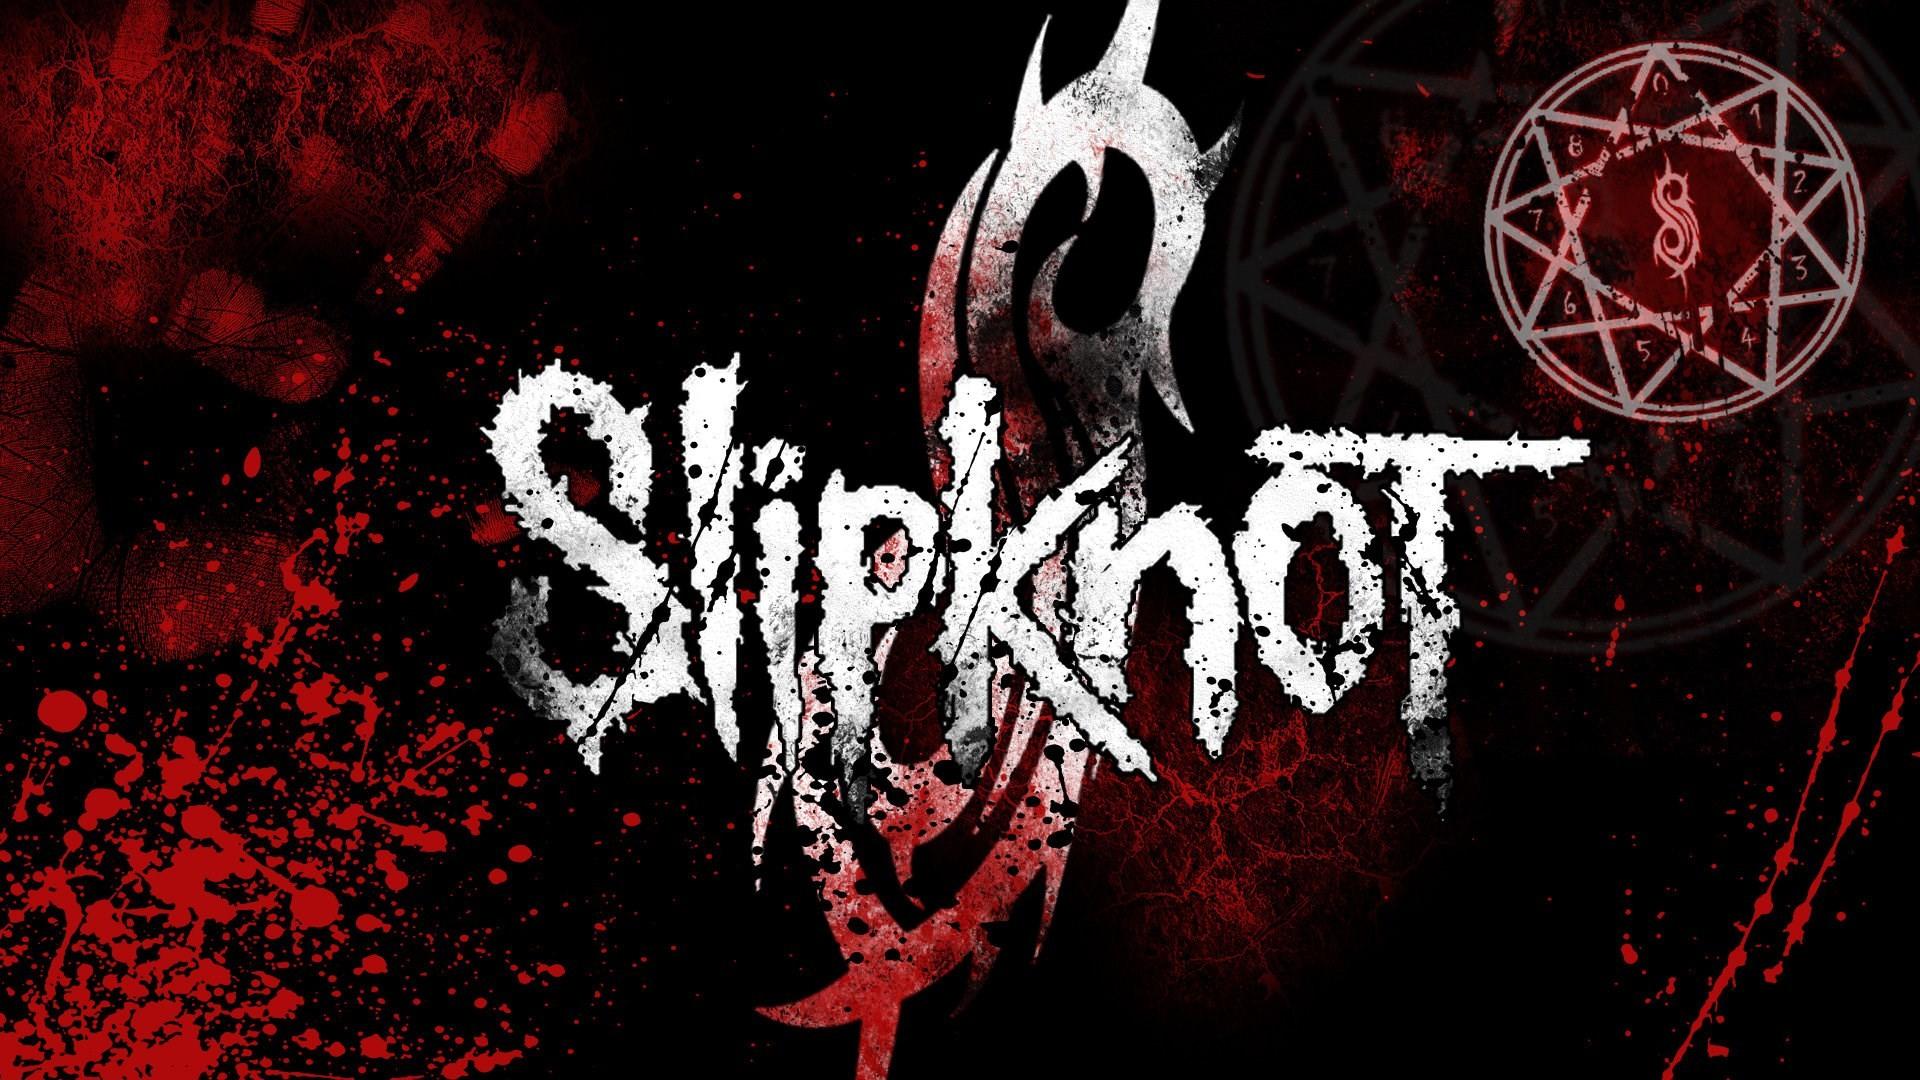 Slipknot logo wallpaper 2018 52 images 1920x1080 slipknot wallpapers voltagebd Image collections